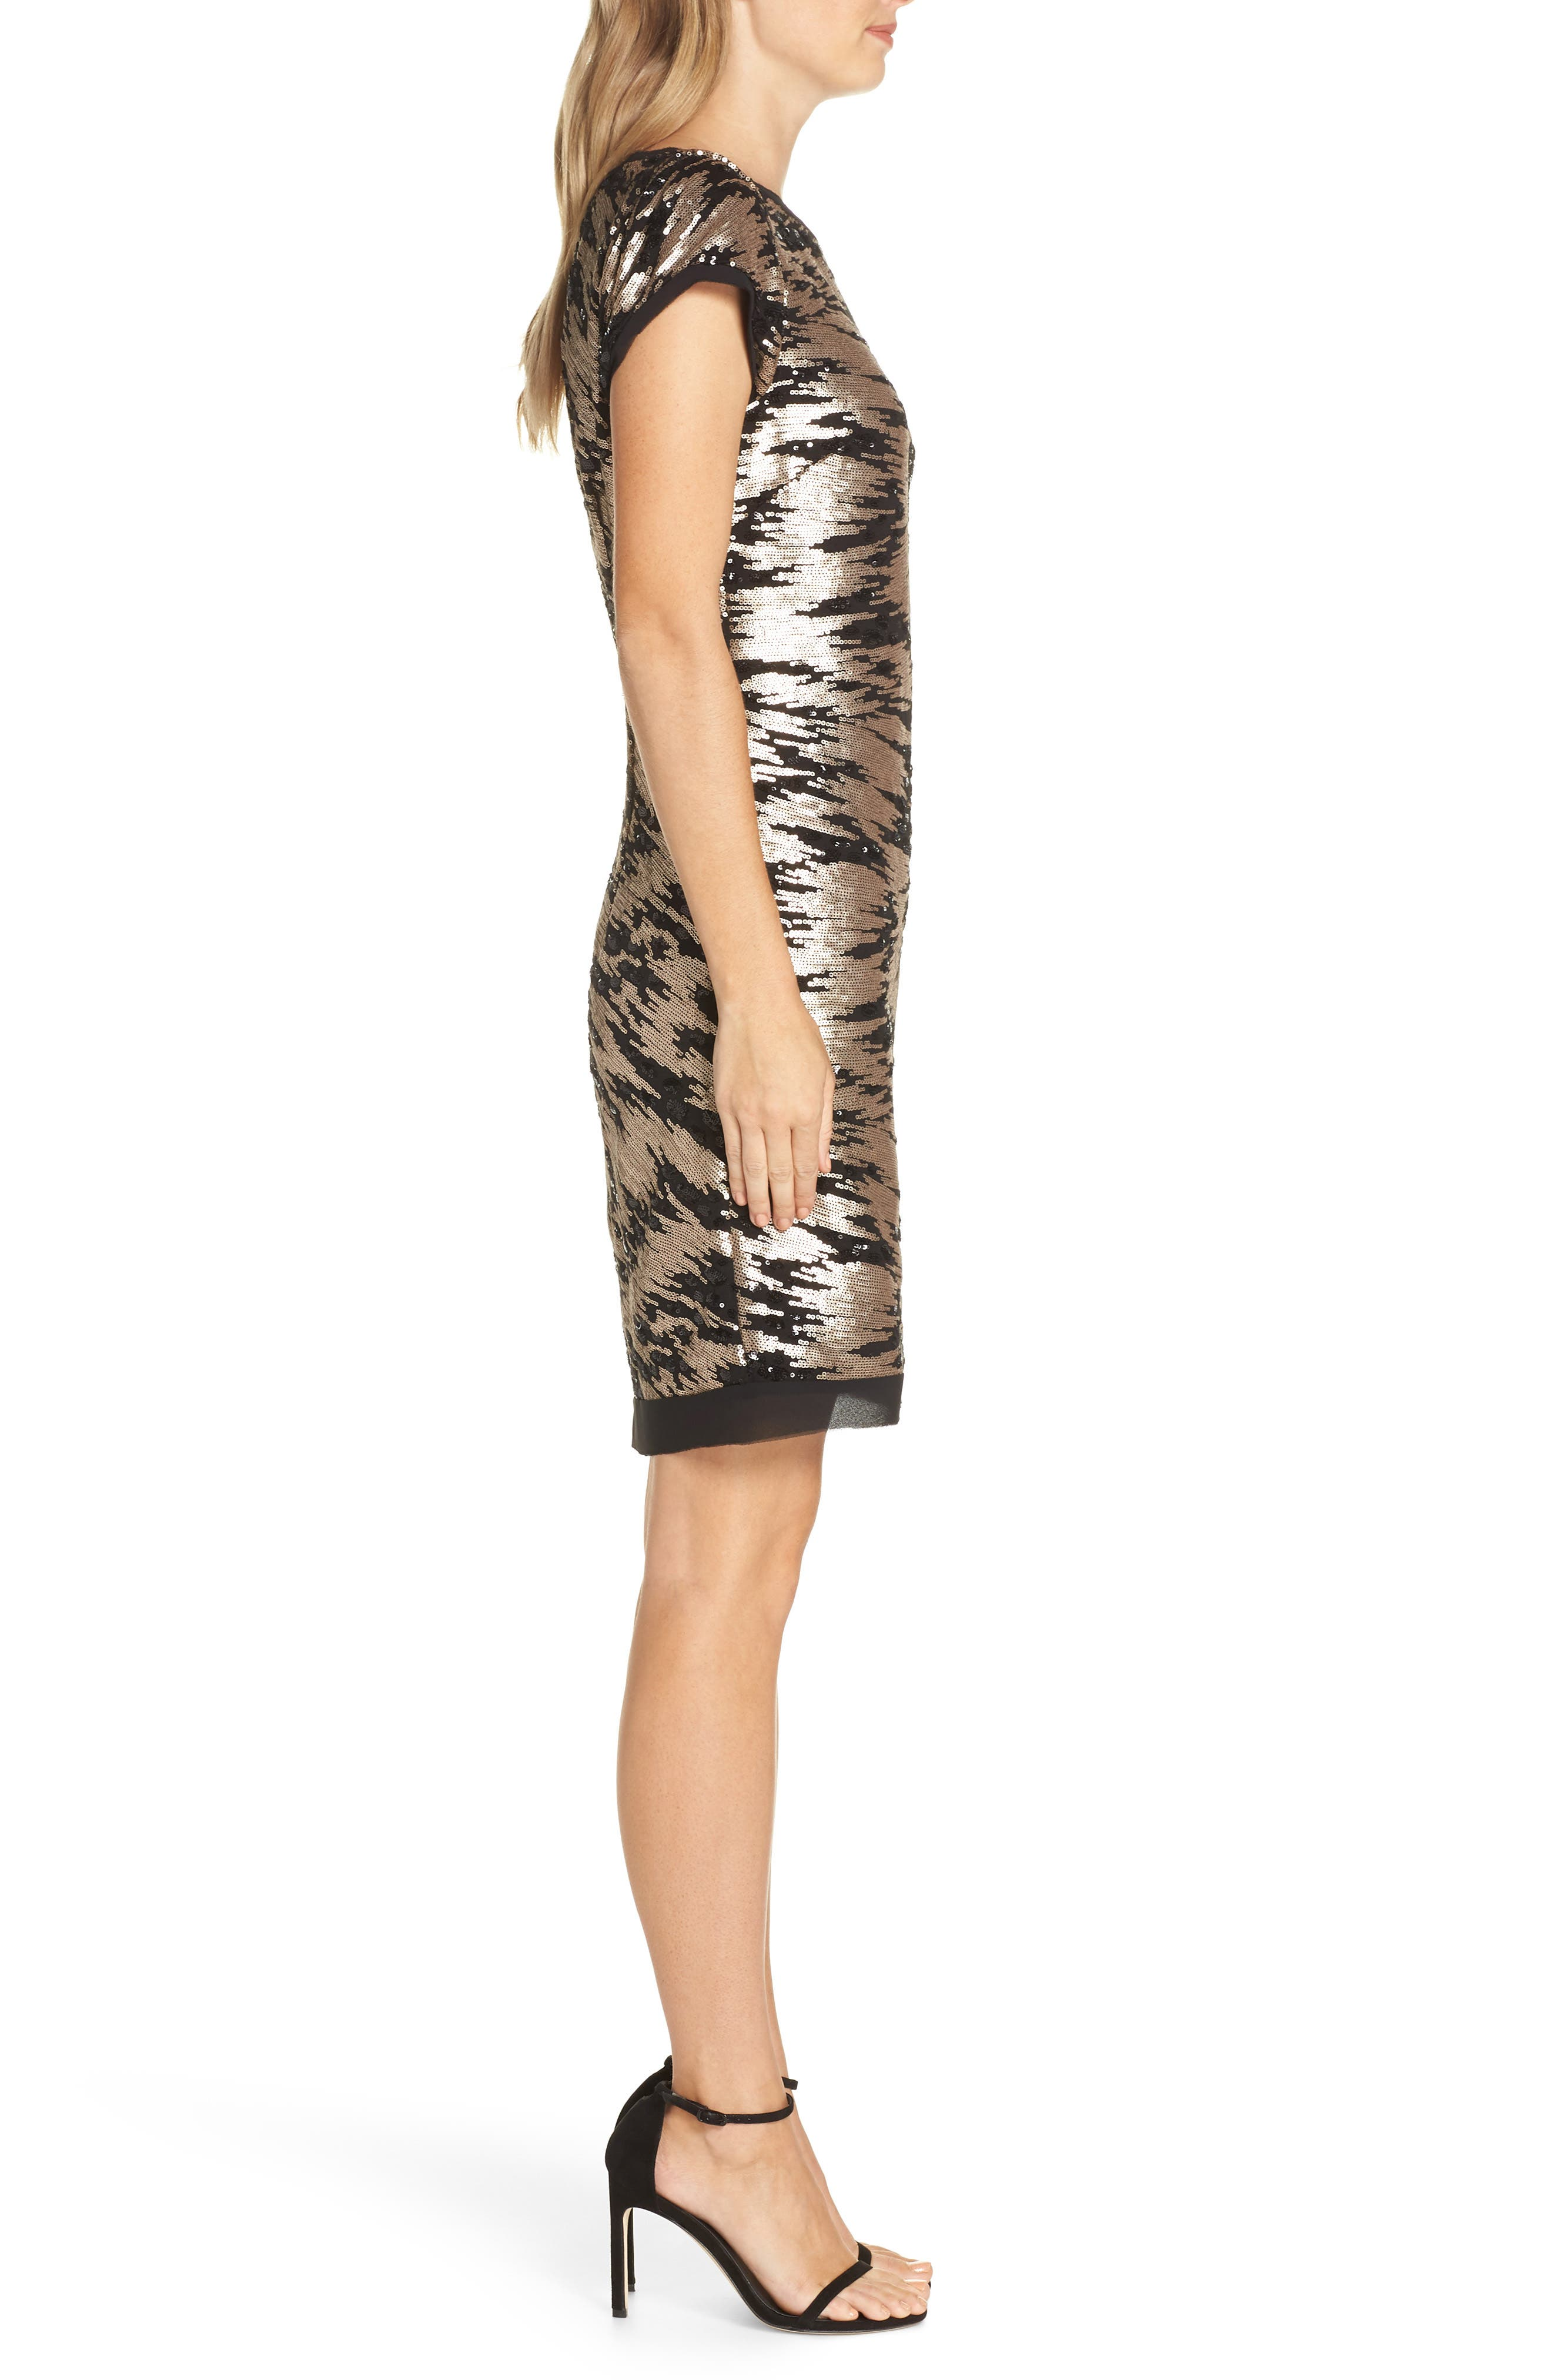 ELIZA J, Sequin Sheath Dress, Alternate thumbnail 4, color, BLACK/ GOLD